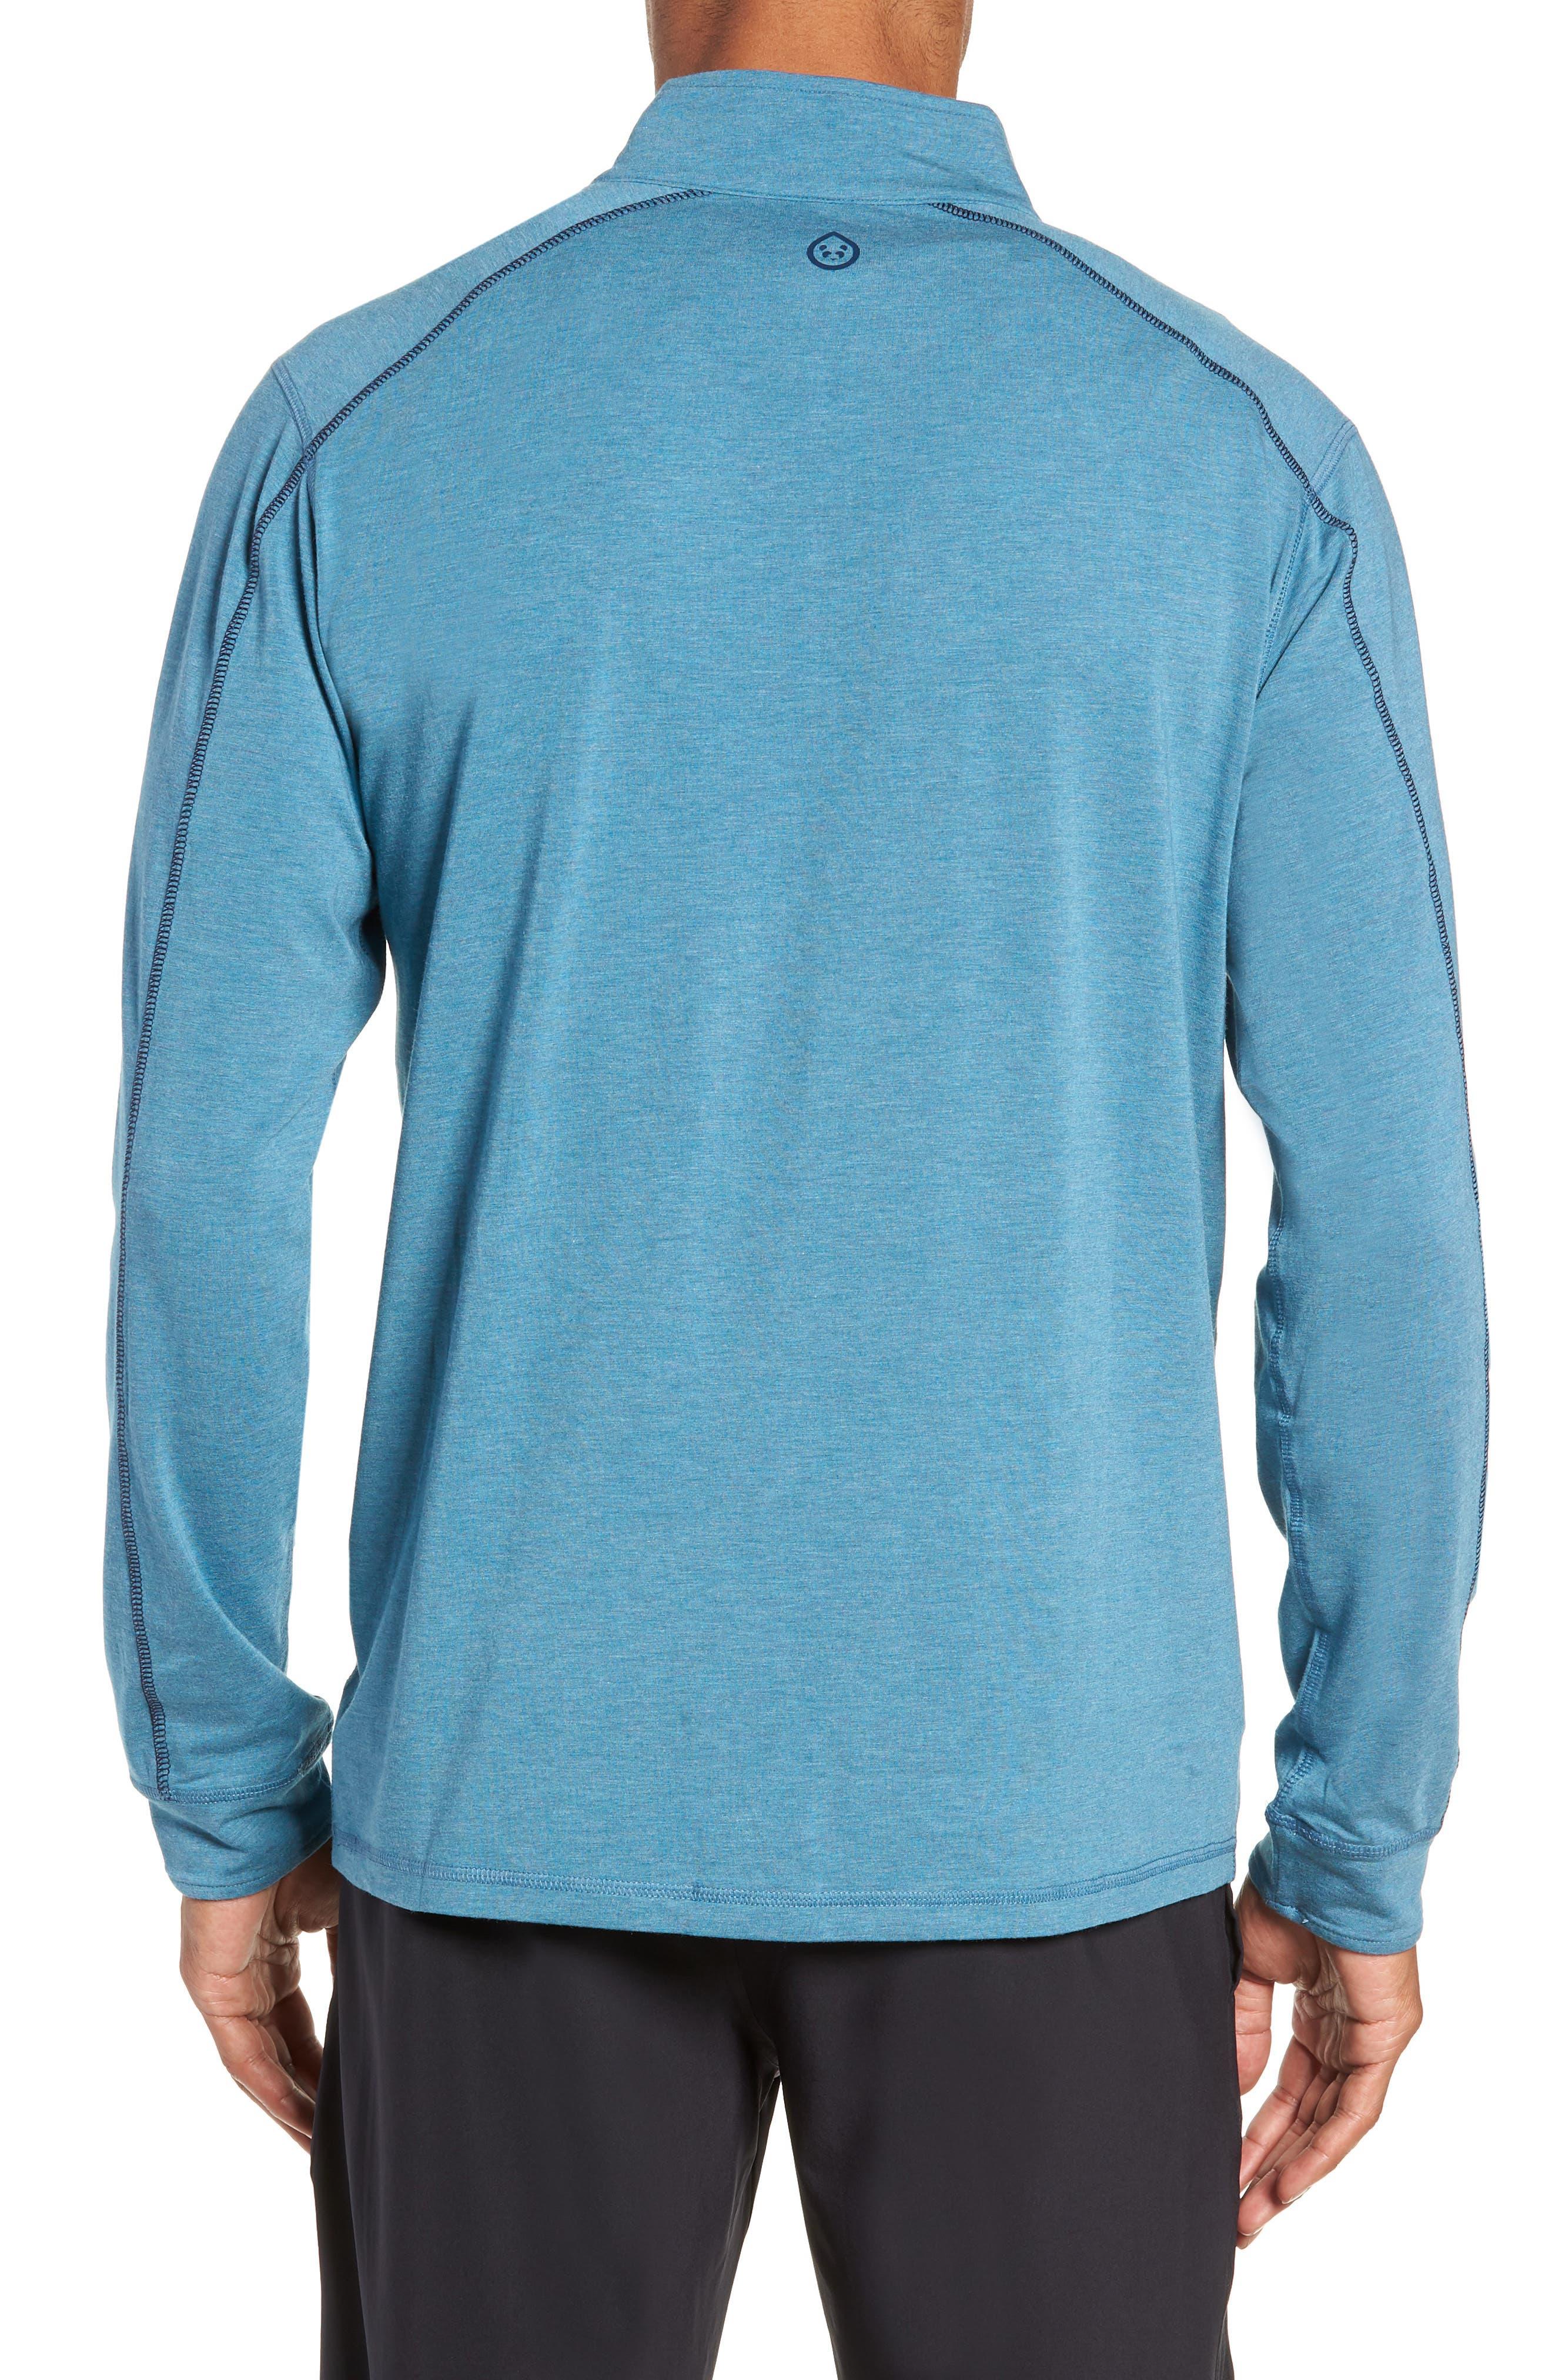 Carrollton Quarter Zip Sweatshirt,                             Alternate thumbnail 2, color,                             Tranquility Sea Heather